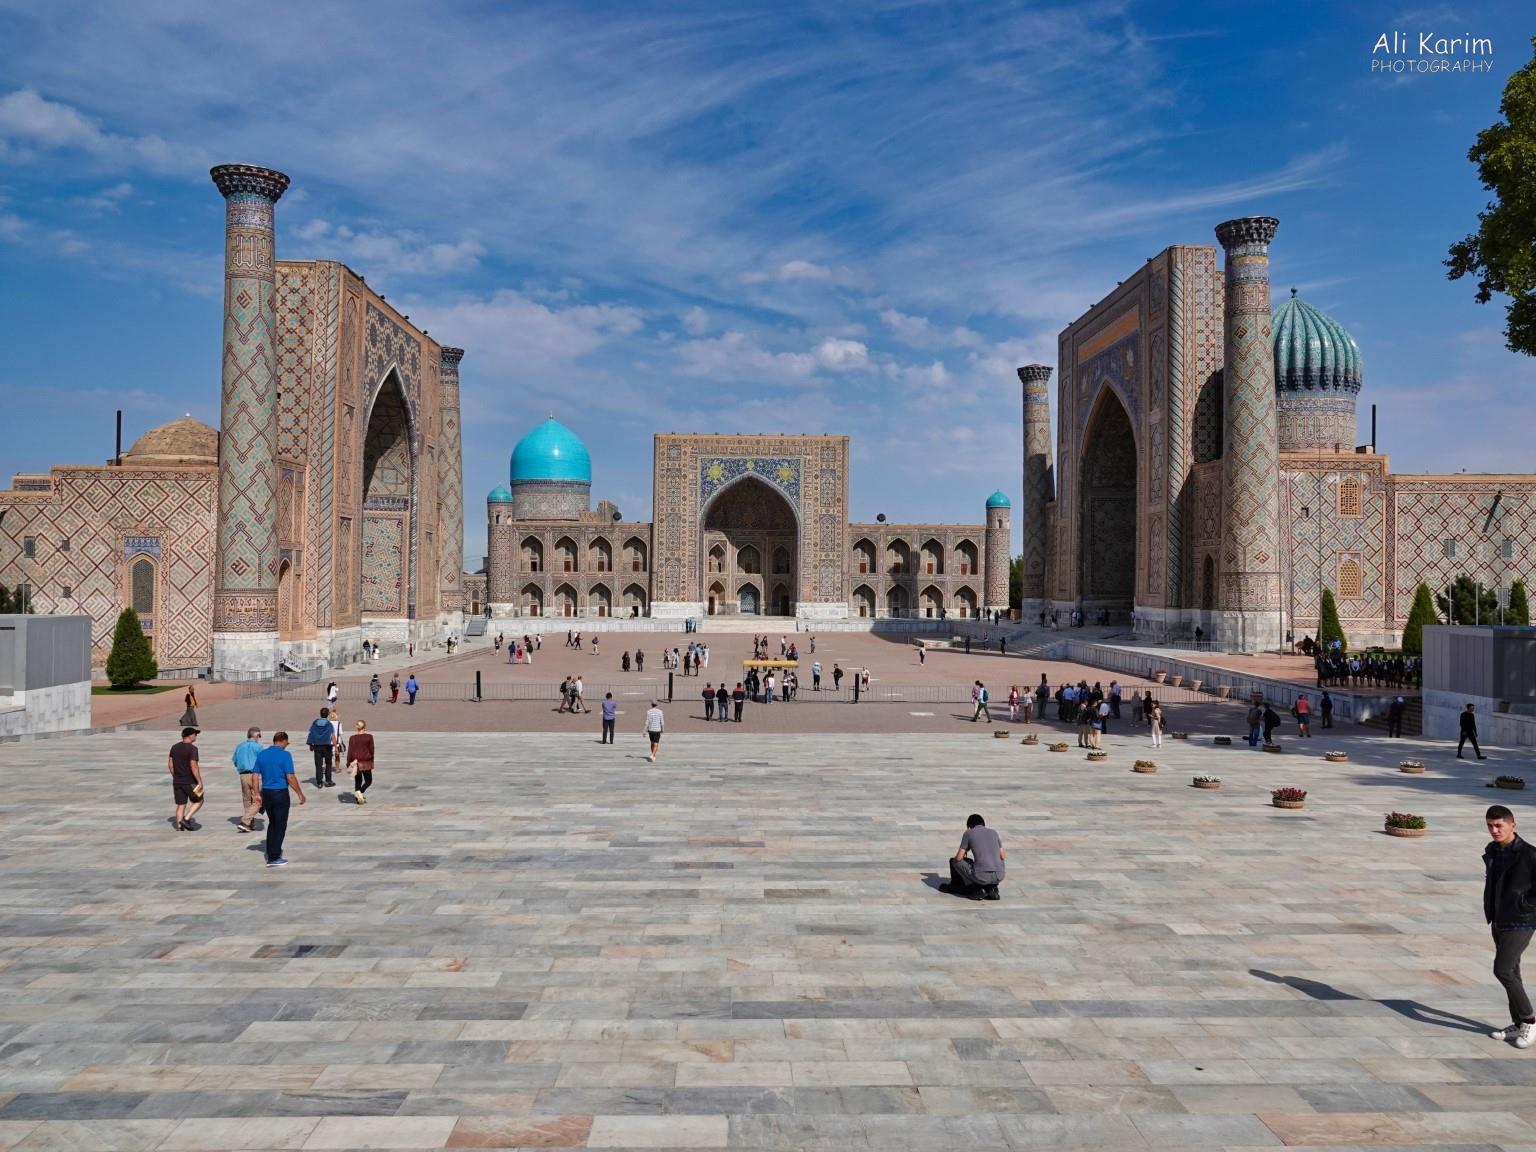 More Samarkand, The Magnificent Registan in the center of Samarkand